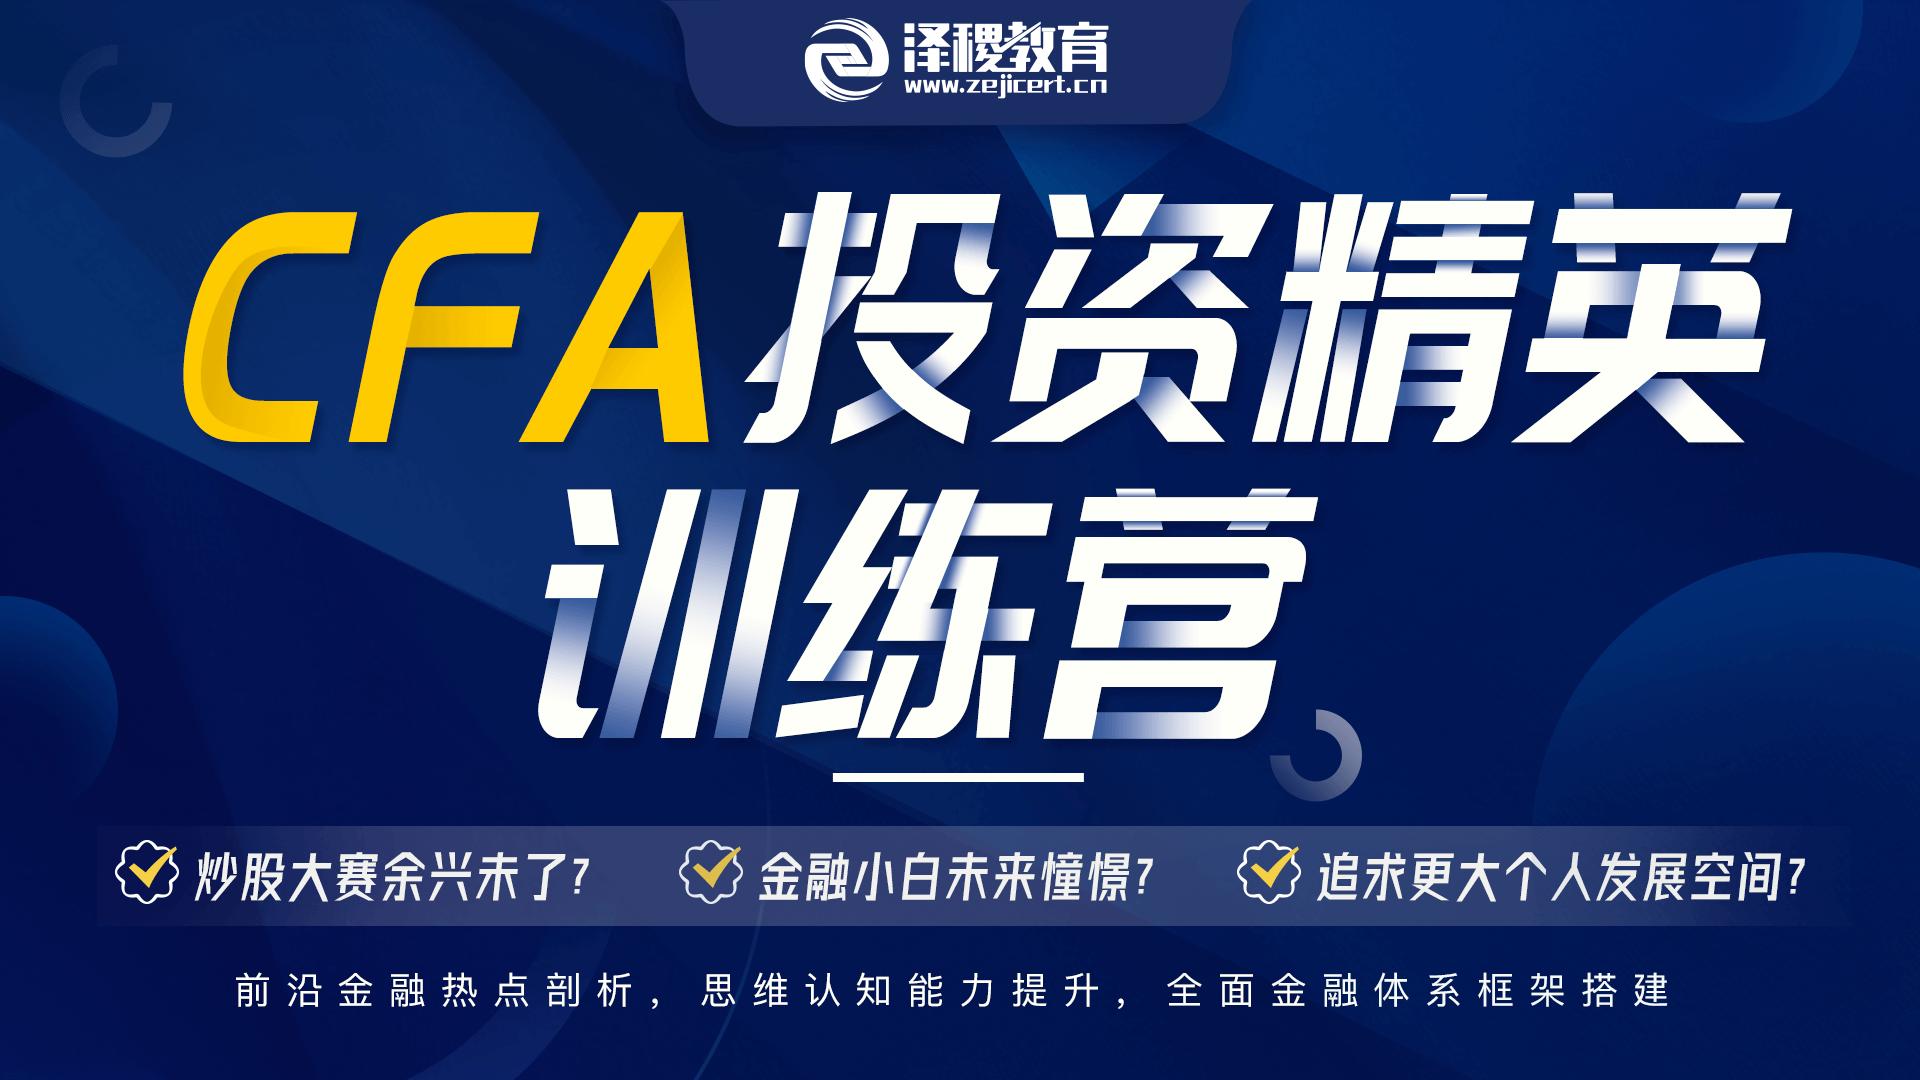 CFA投资精英训练营